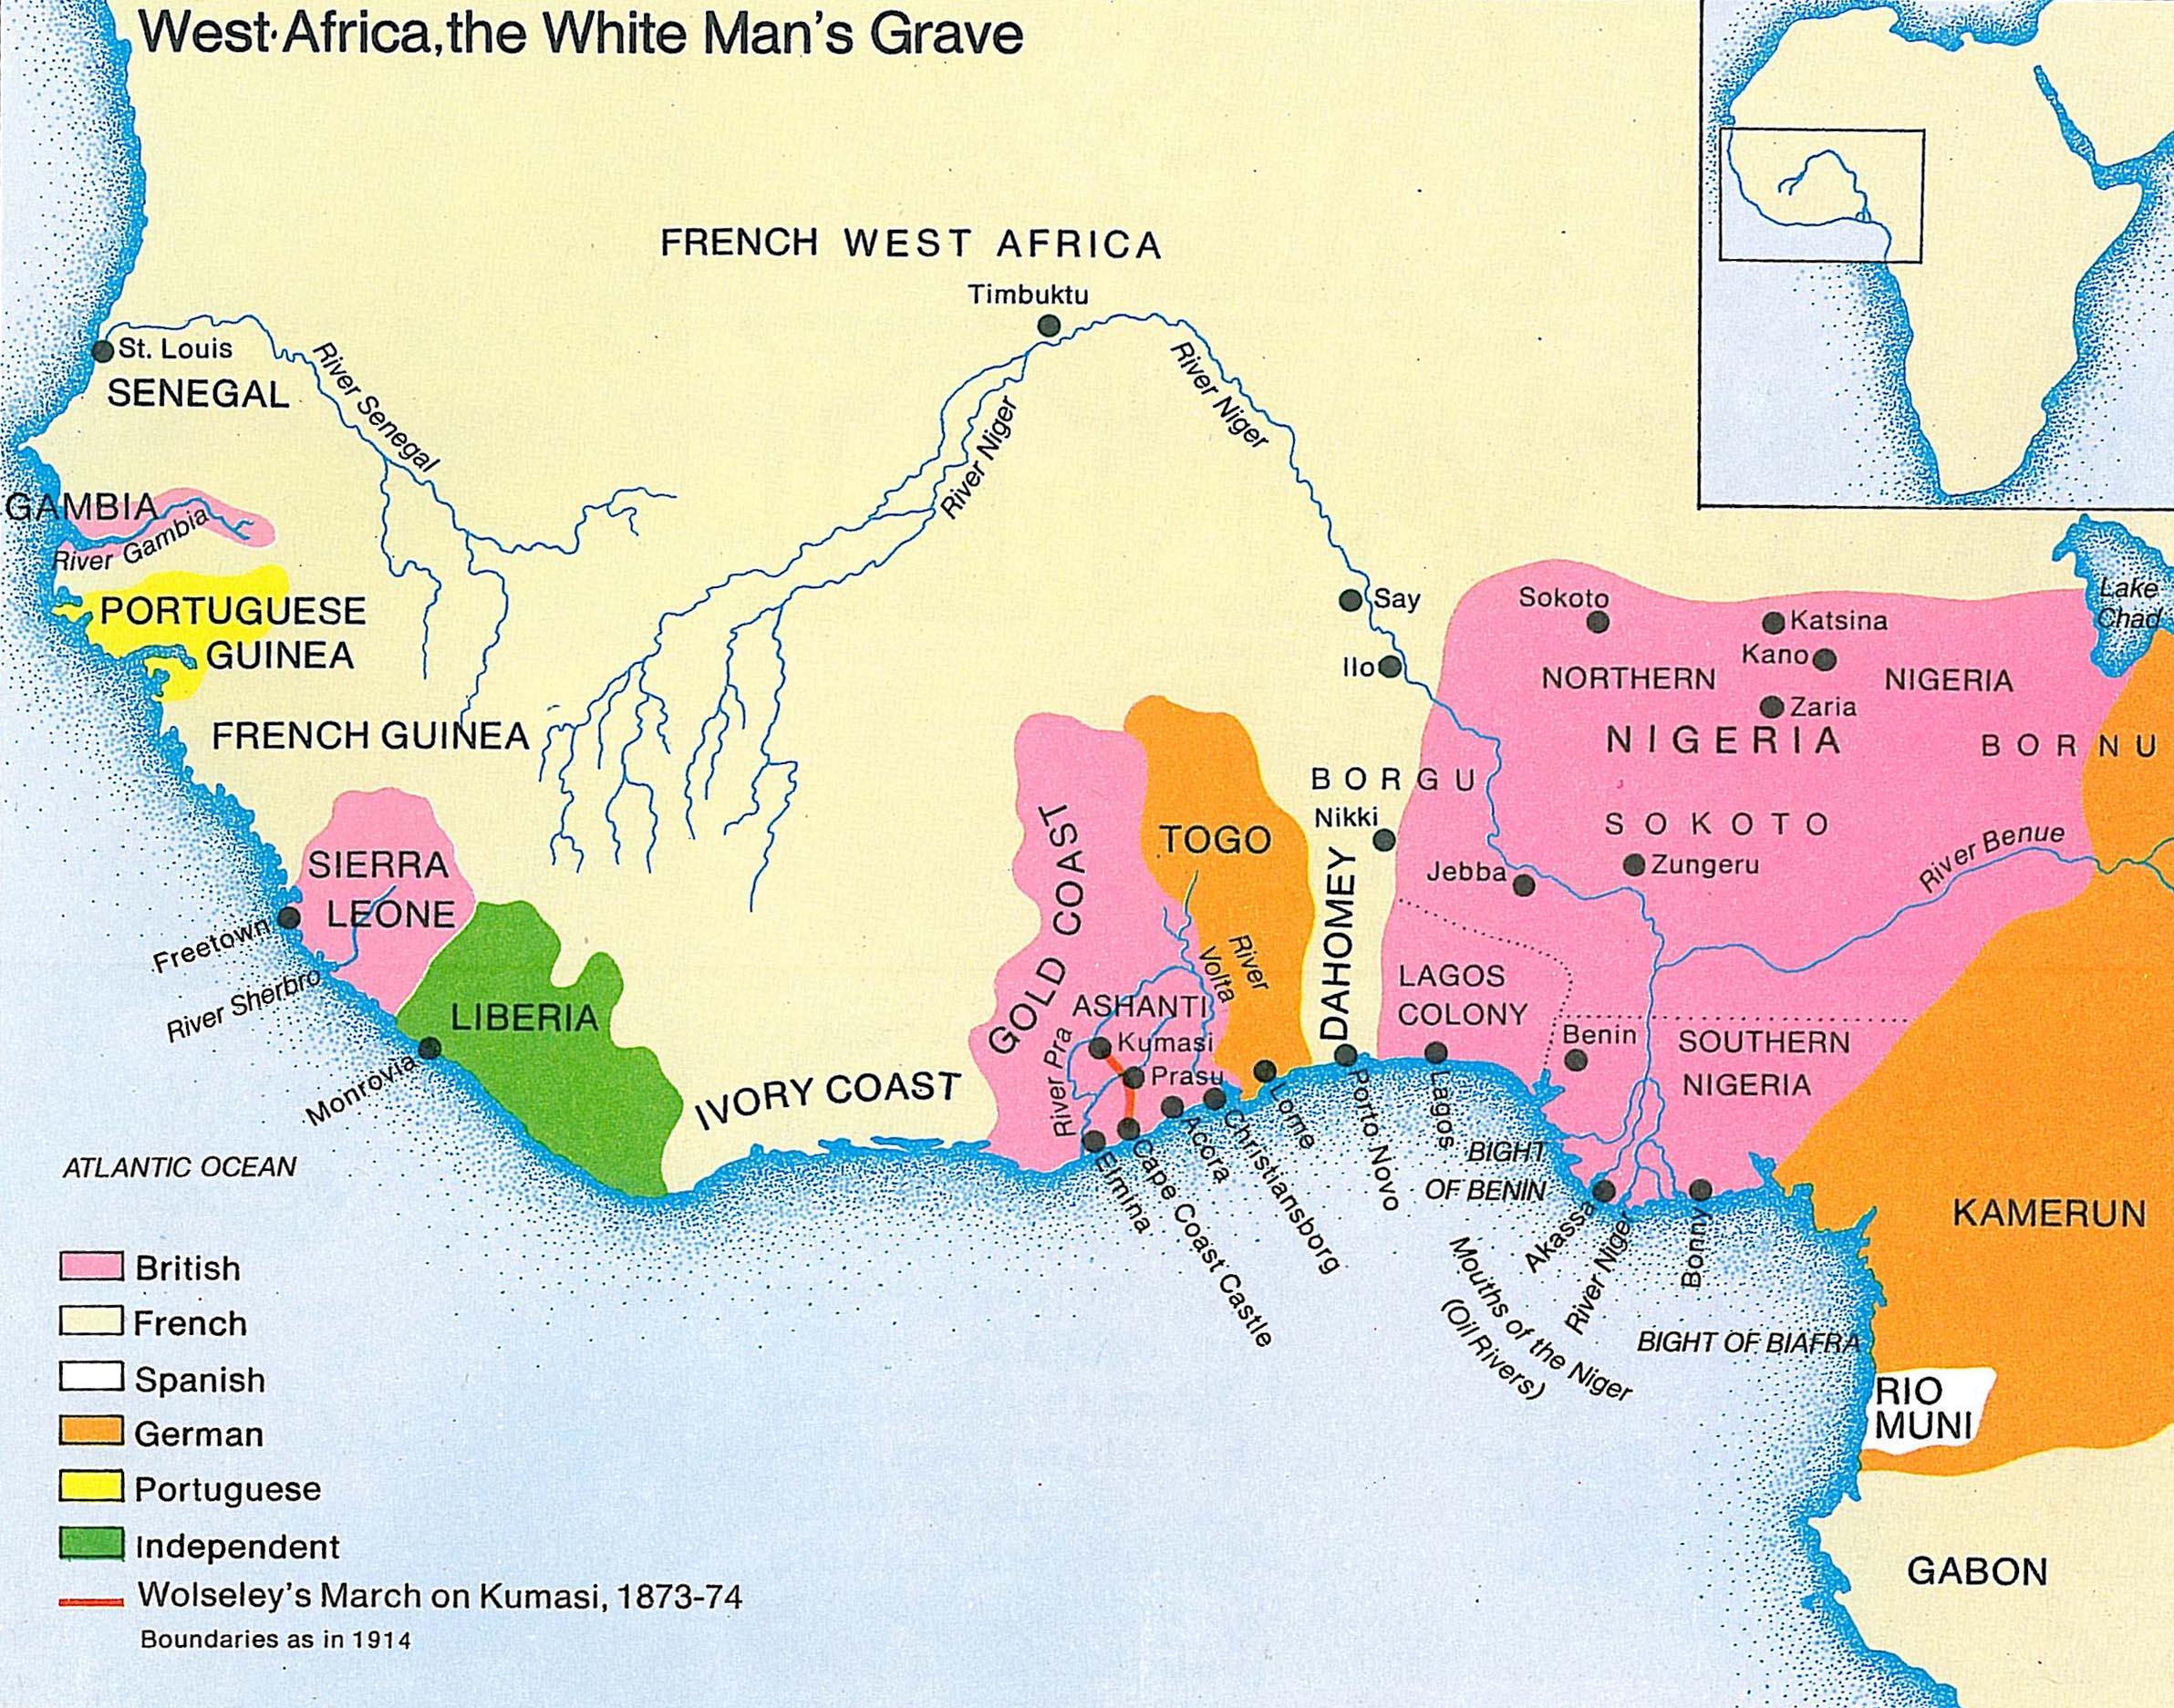 The British Empire in Africa